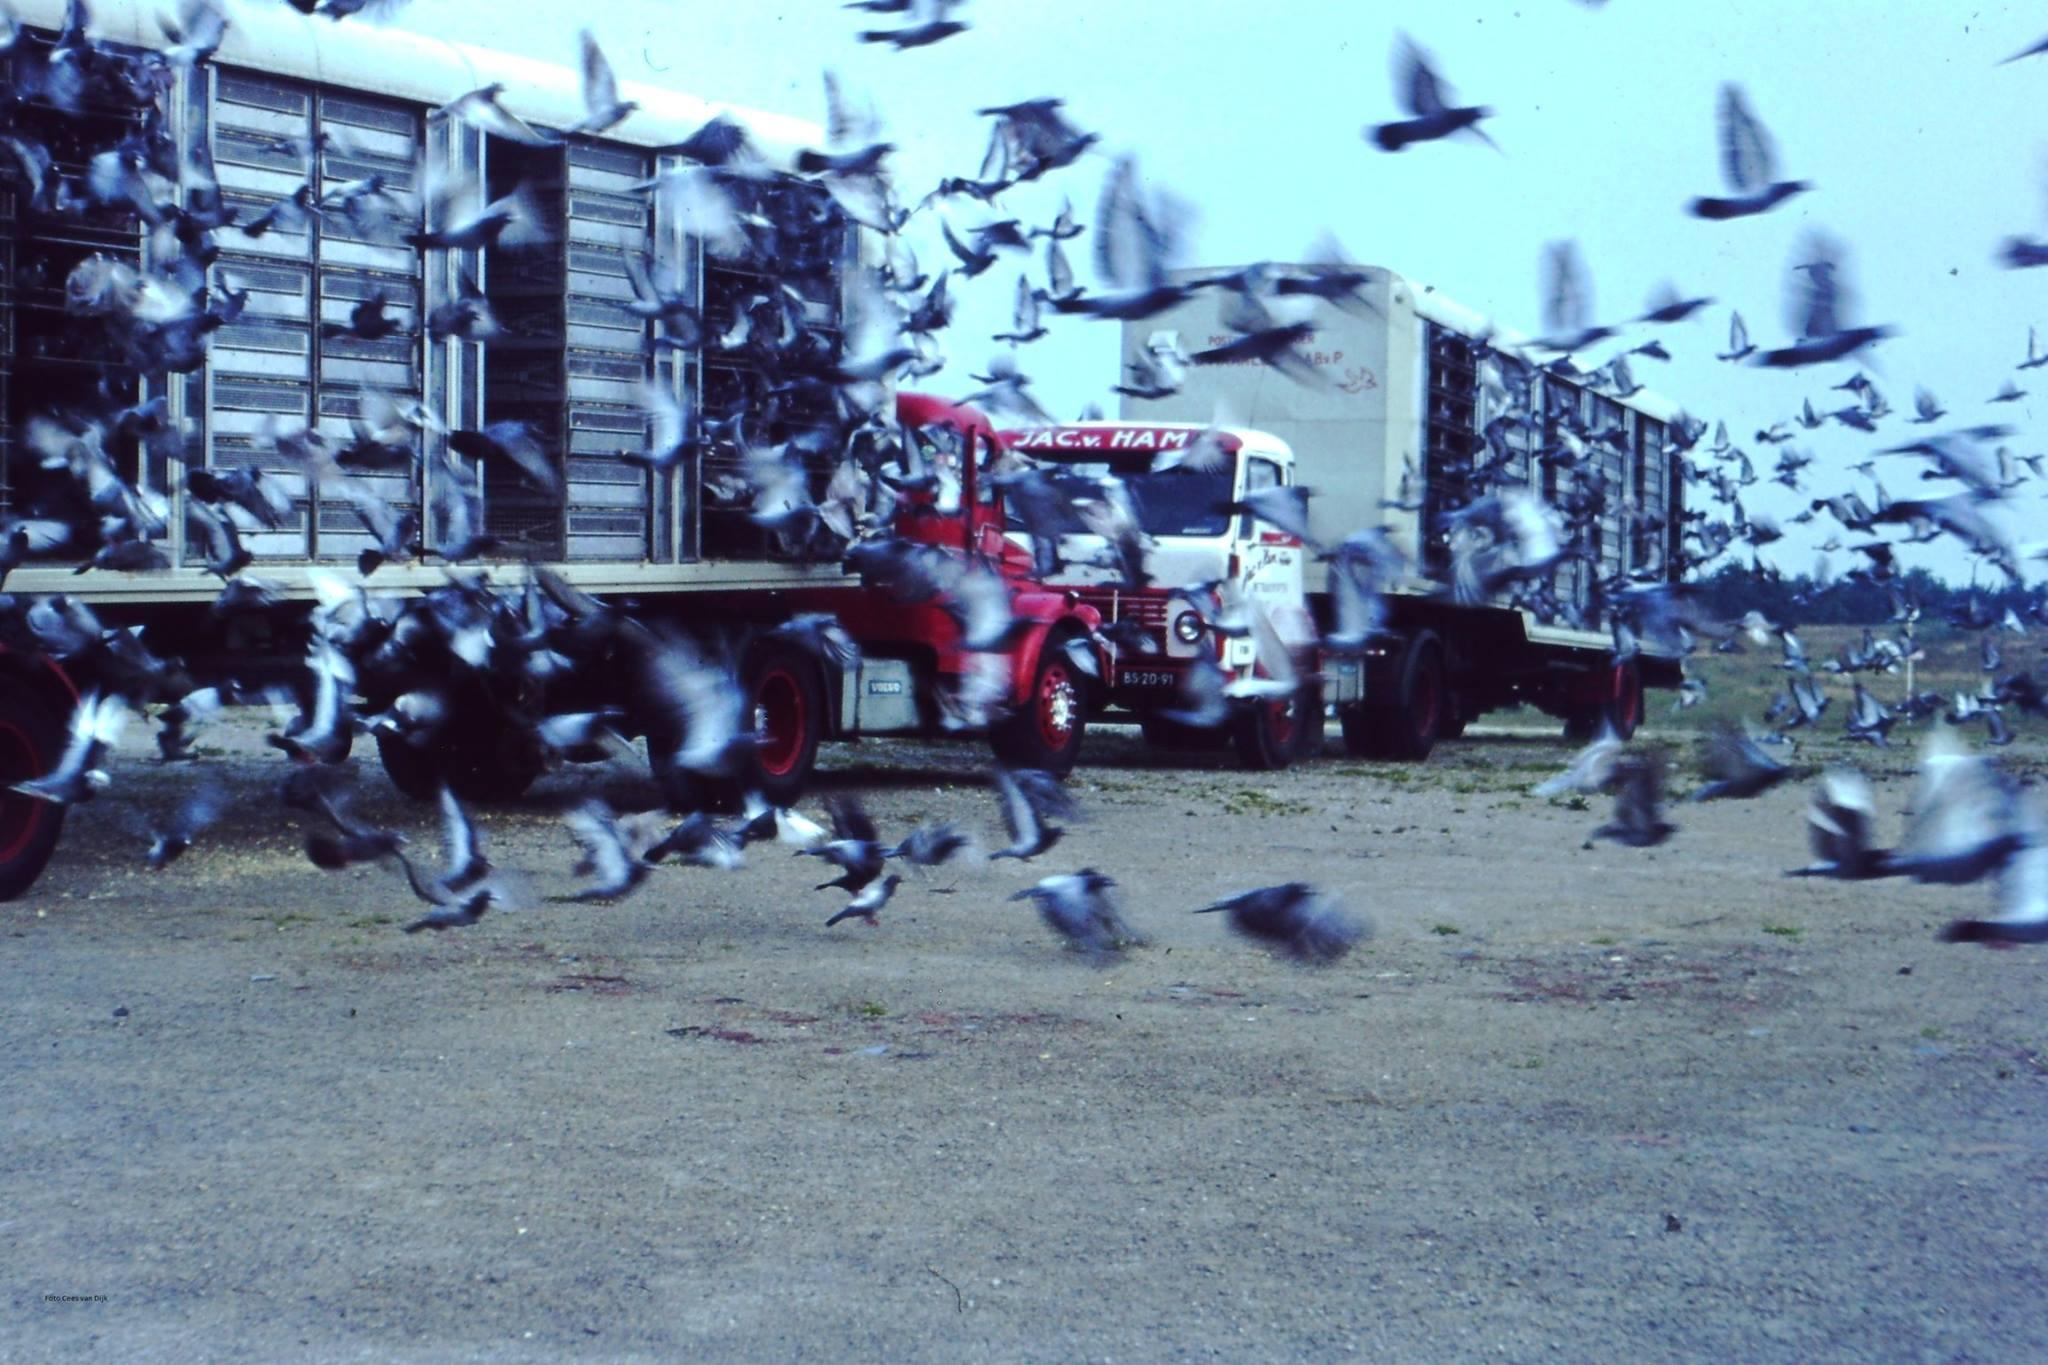 Volvo-s--duiven-lossen